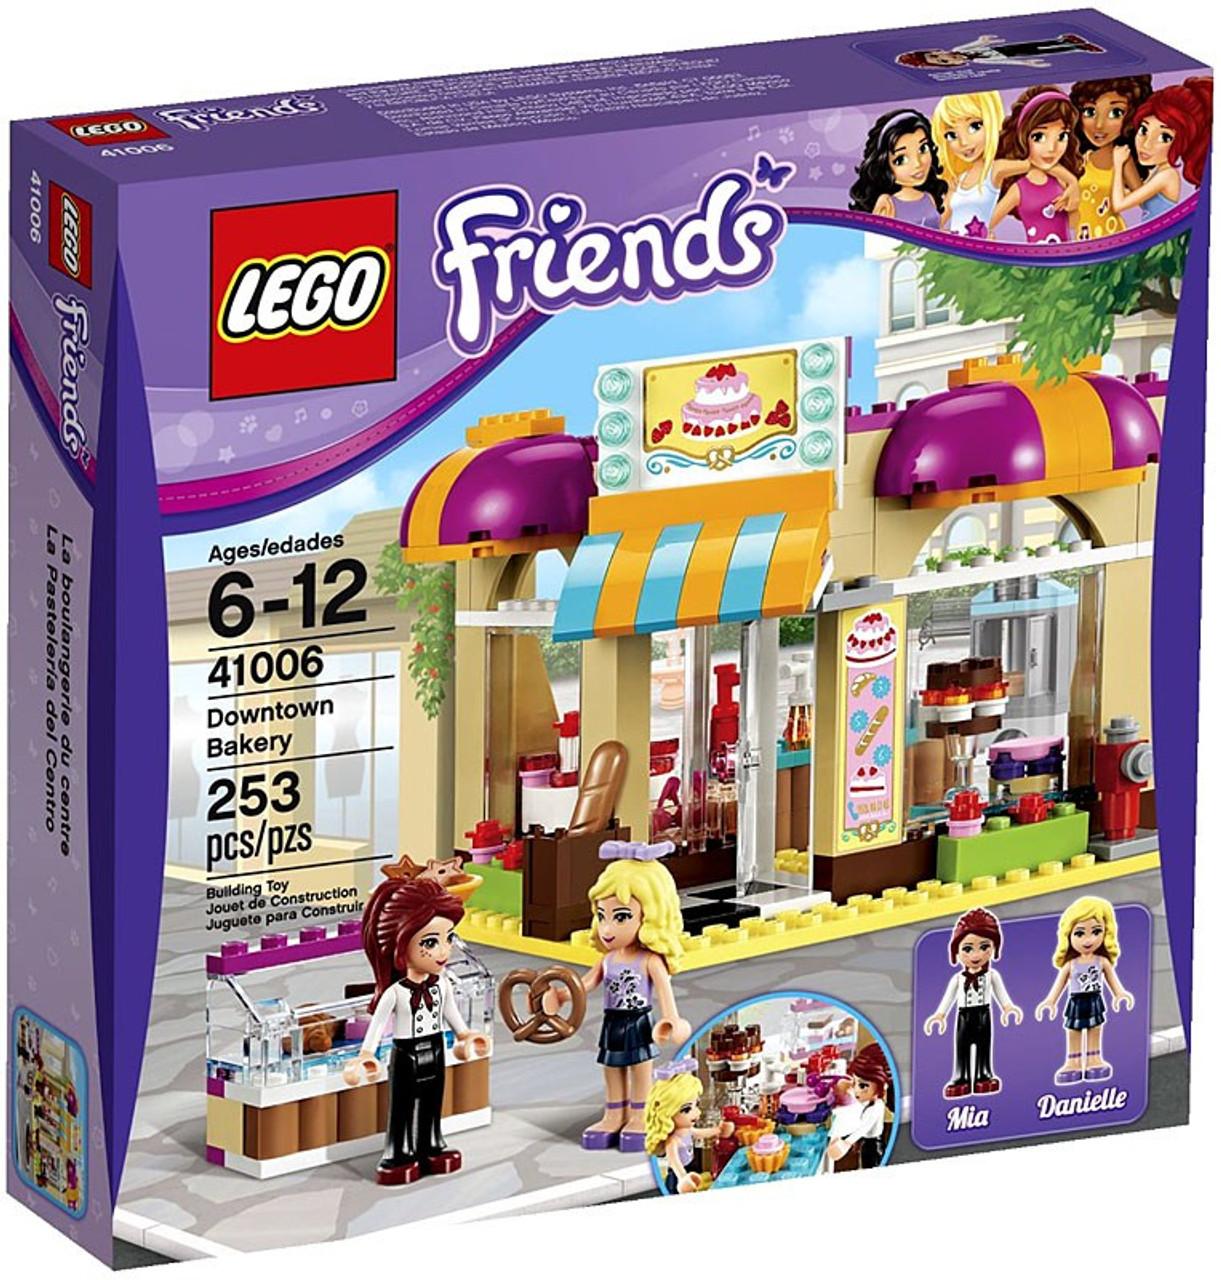 LEGO Friends Downtown Bakery Set #41006